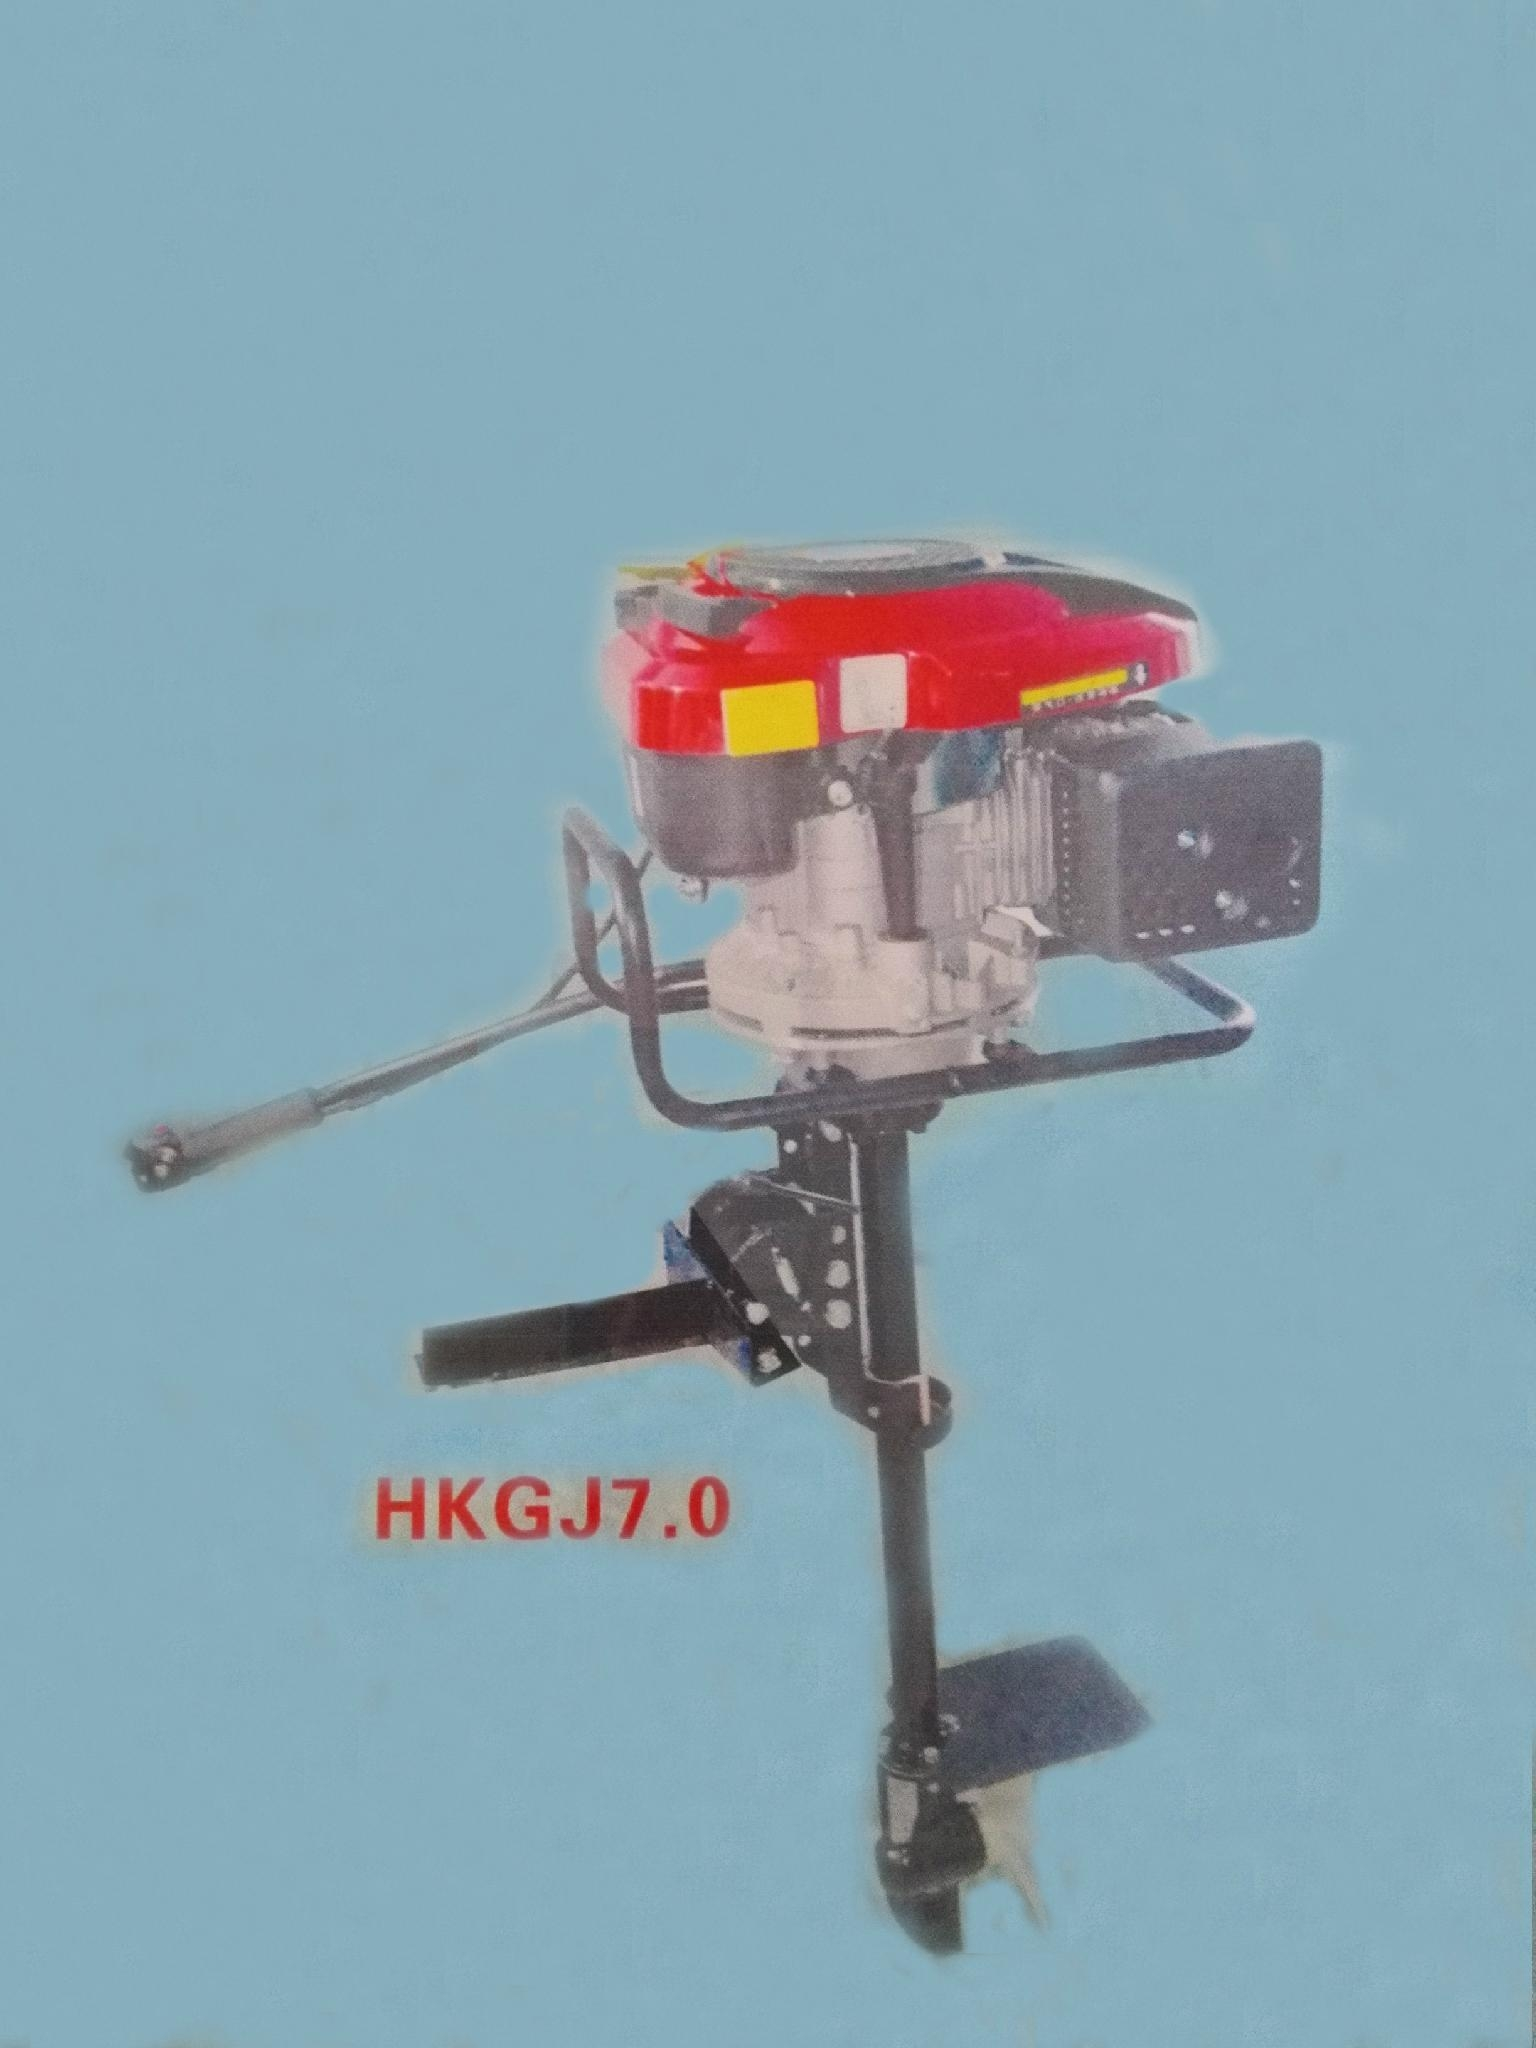 Electric Gasoline Outboard Motor Hkgj6 0 Petros